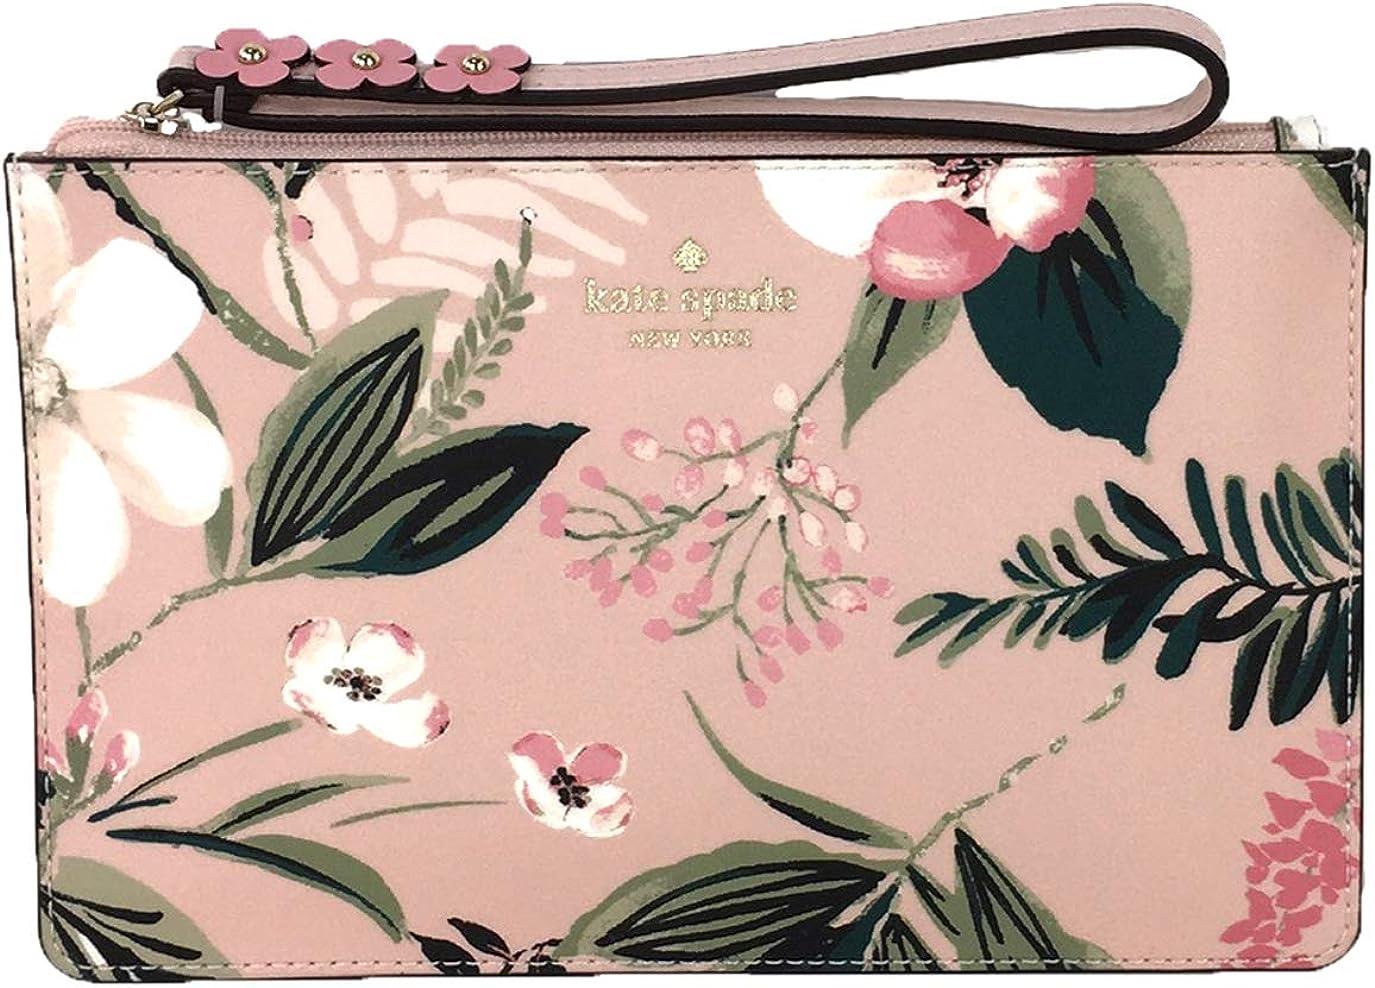 Kate Spade Botanical Floral Leather Eli Wristlet, Cameo Pink